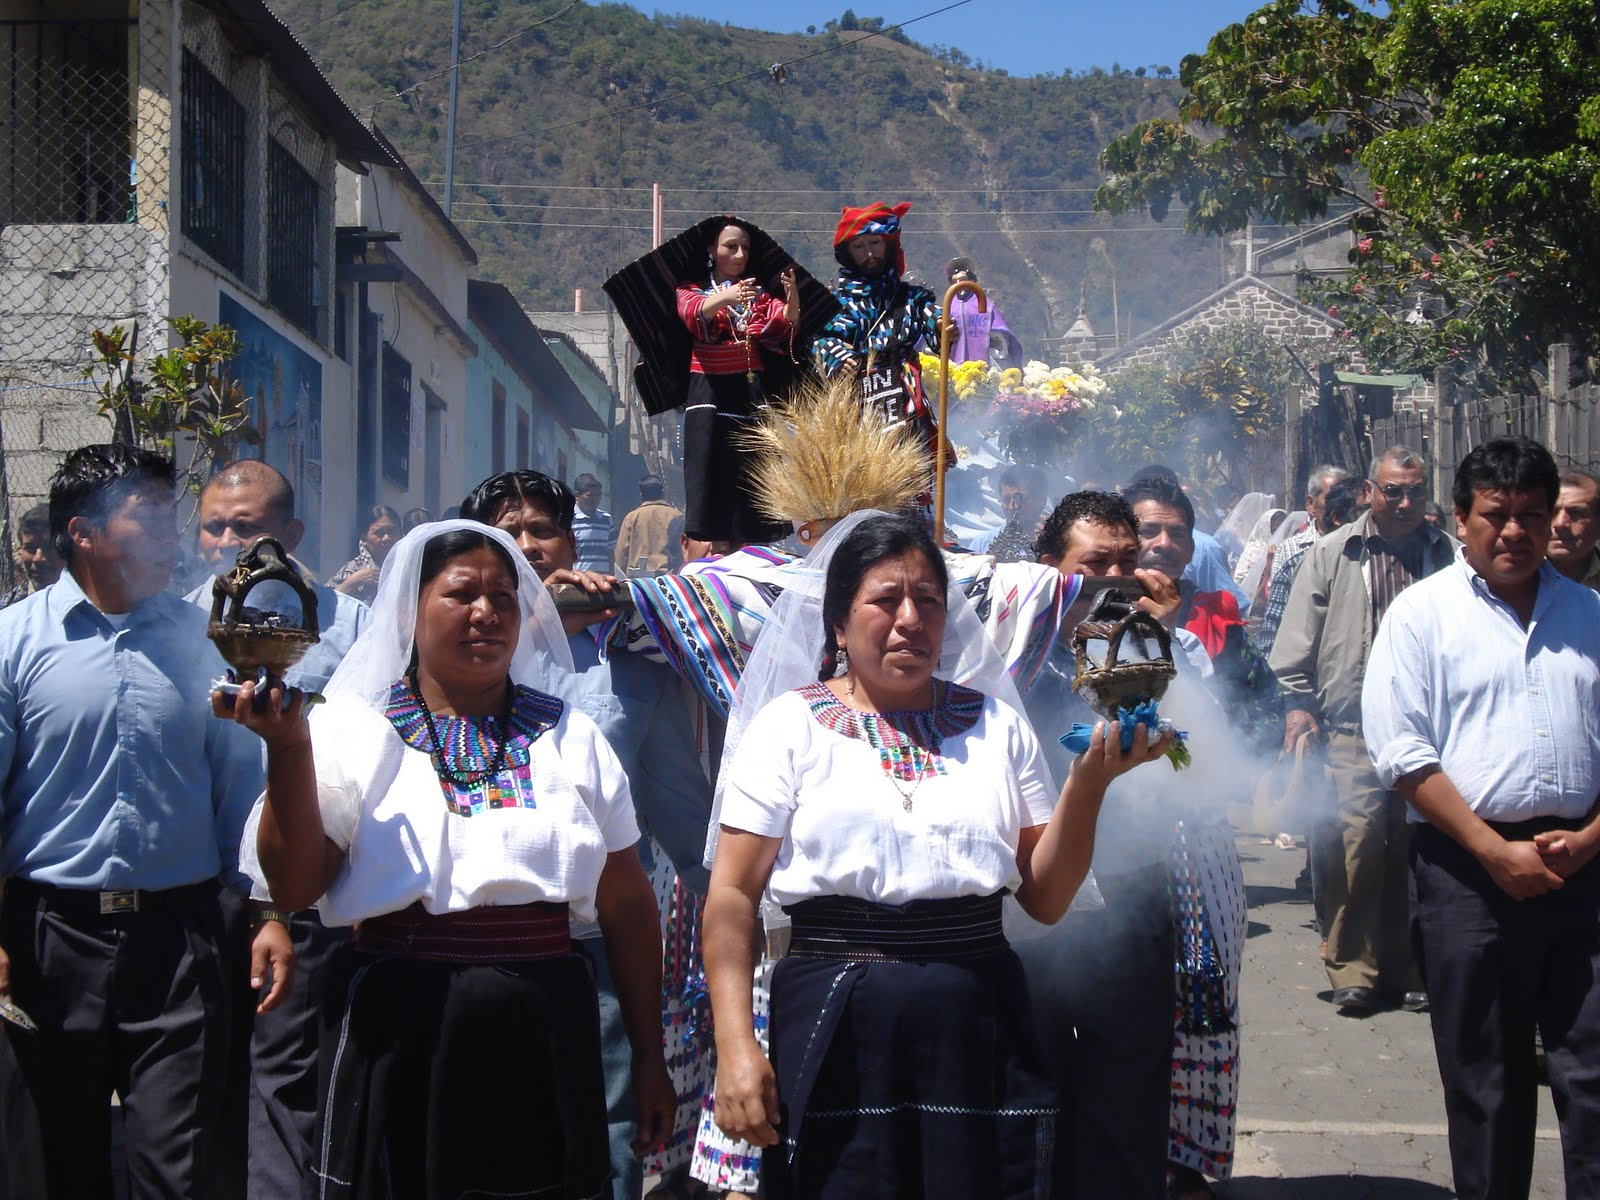 Religious procession in San Juan